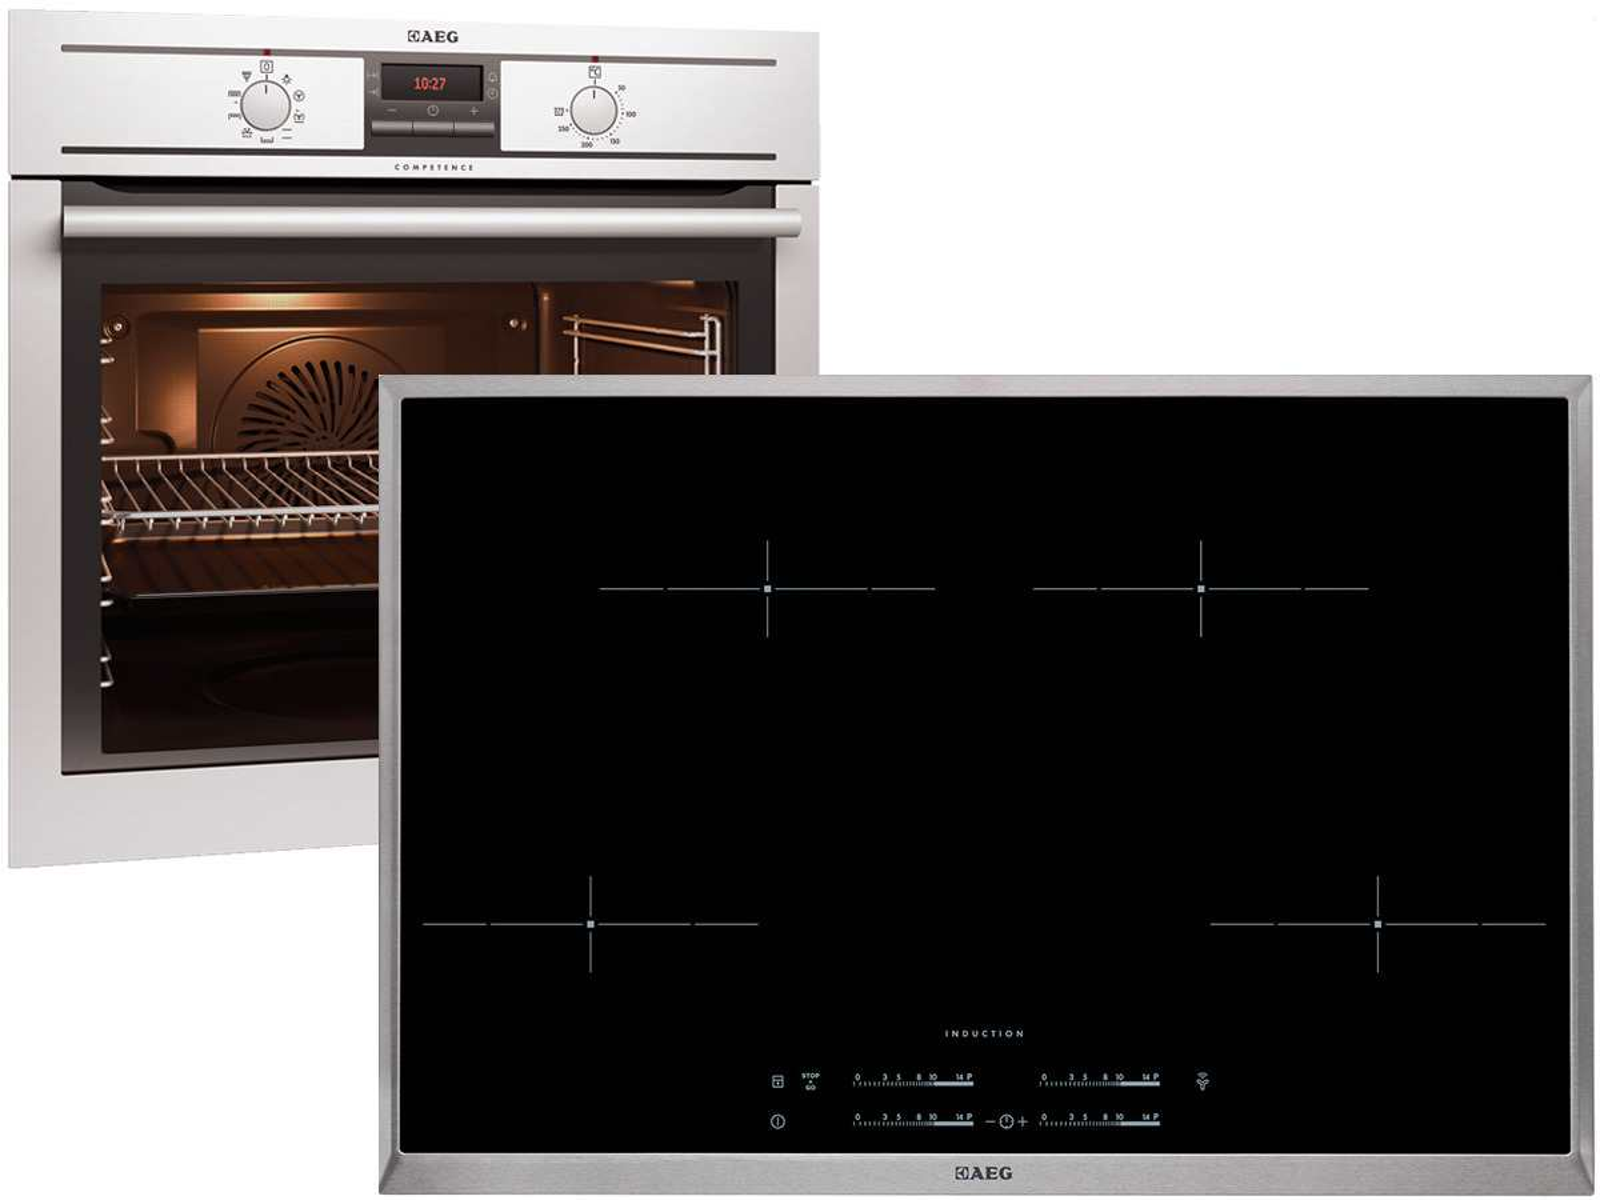 aeg be31986 backofenset be3003001m induktion kochzone hk854401x b auflage 77cm ebay. Black Bedroom Furniture Sets. Home Design Ideas